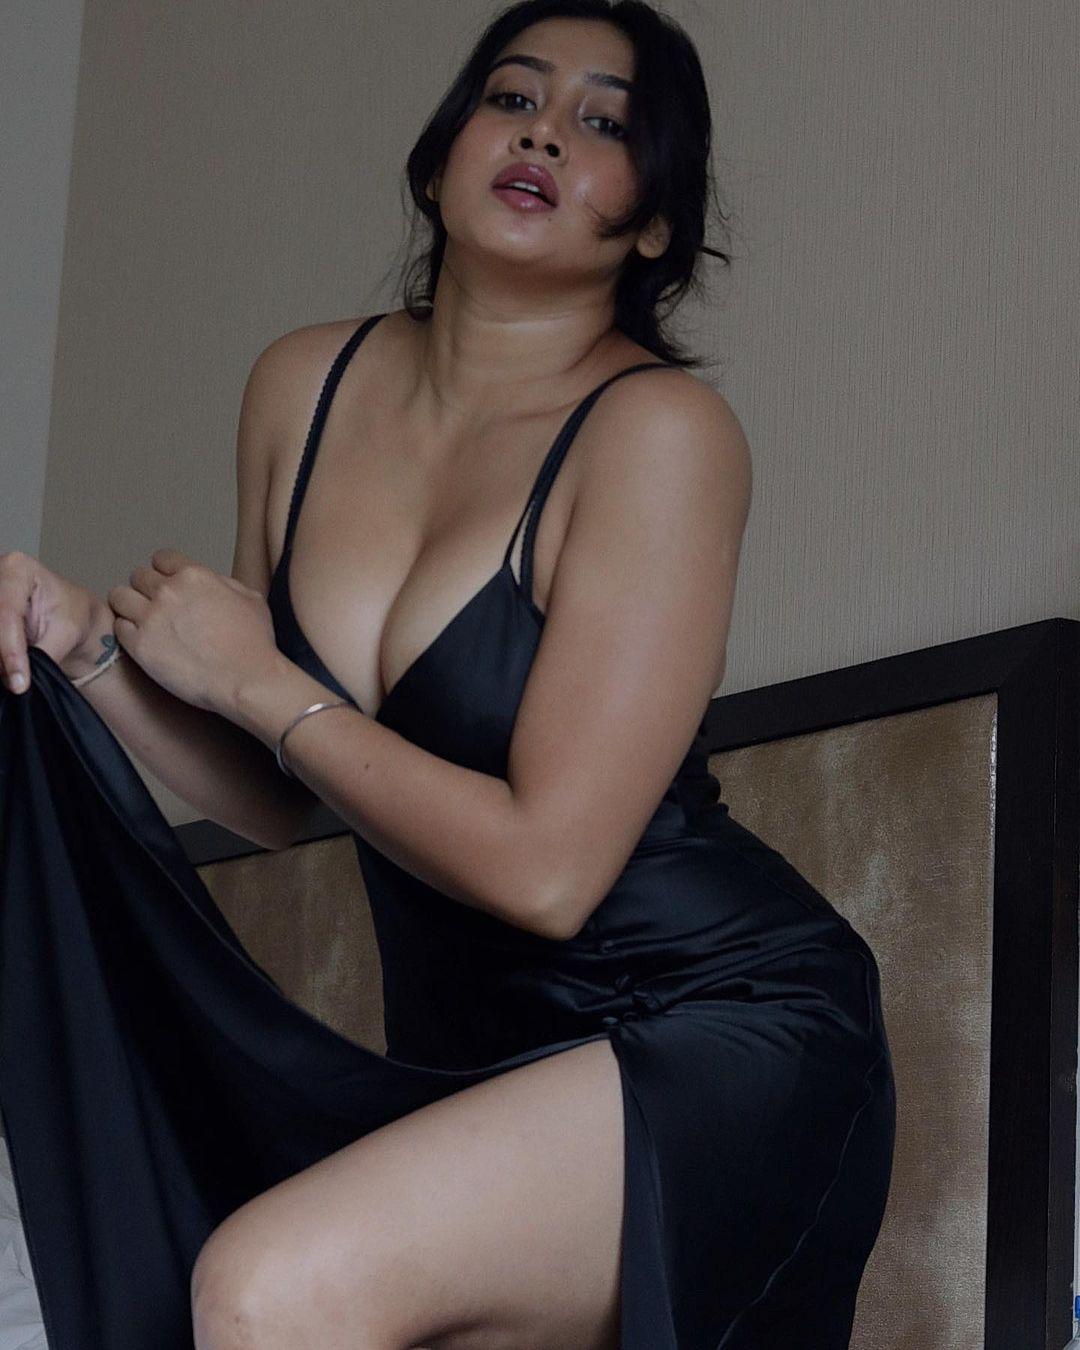 Sofia Ansari Instagram Pics Photos and Wallpaper